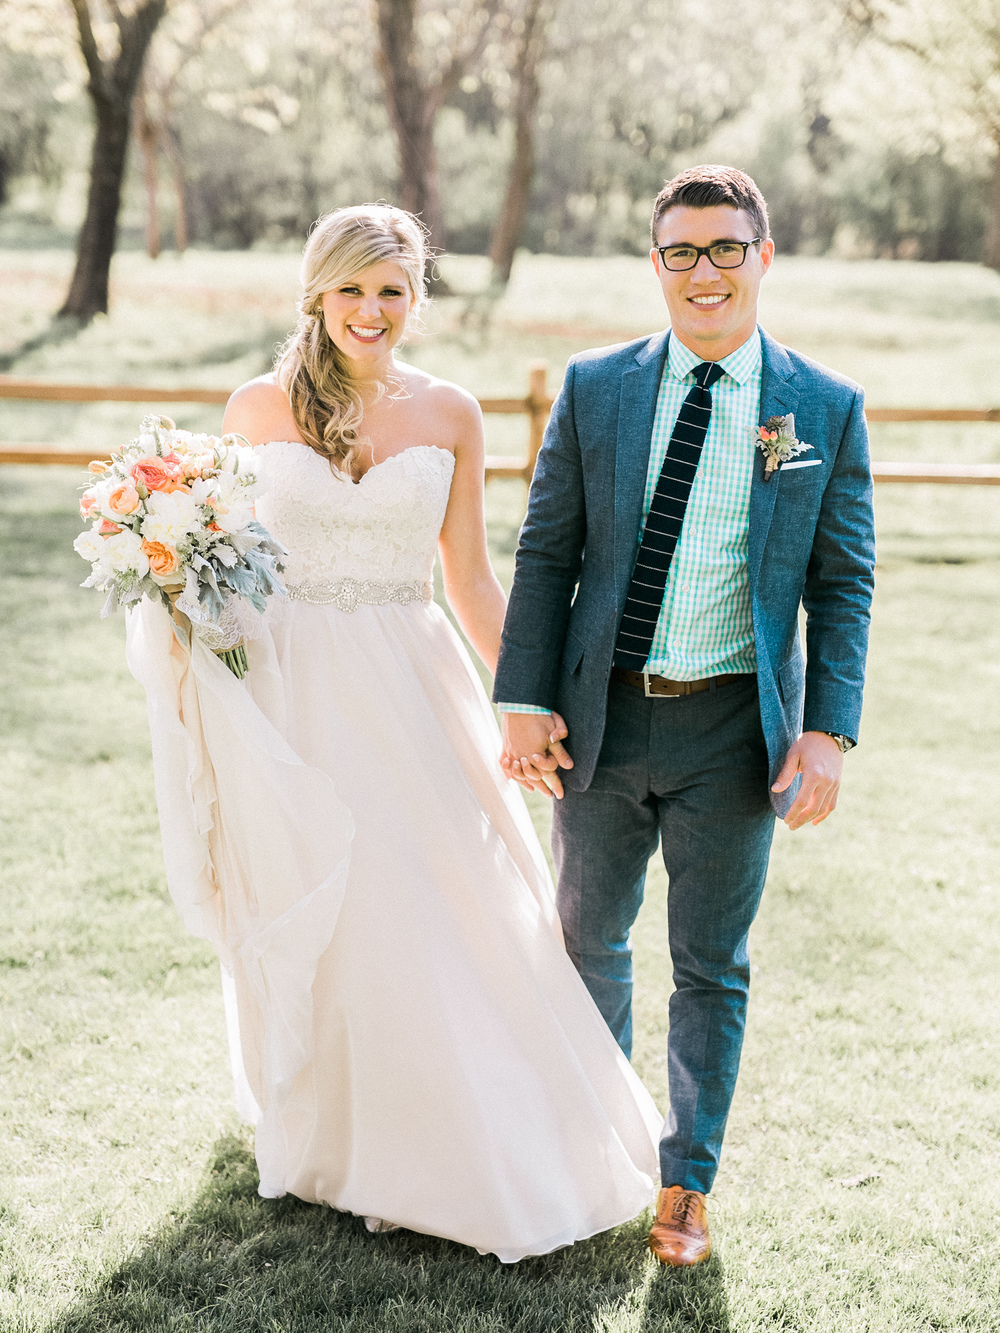 Chisolm_Springs_Wedding_OKC_Film_photographer-7.jpg